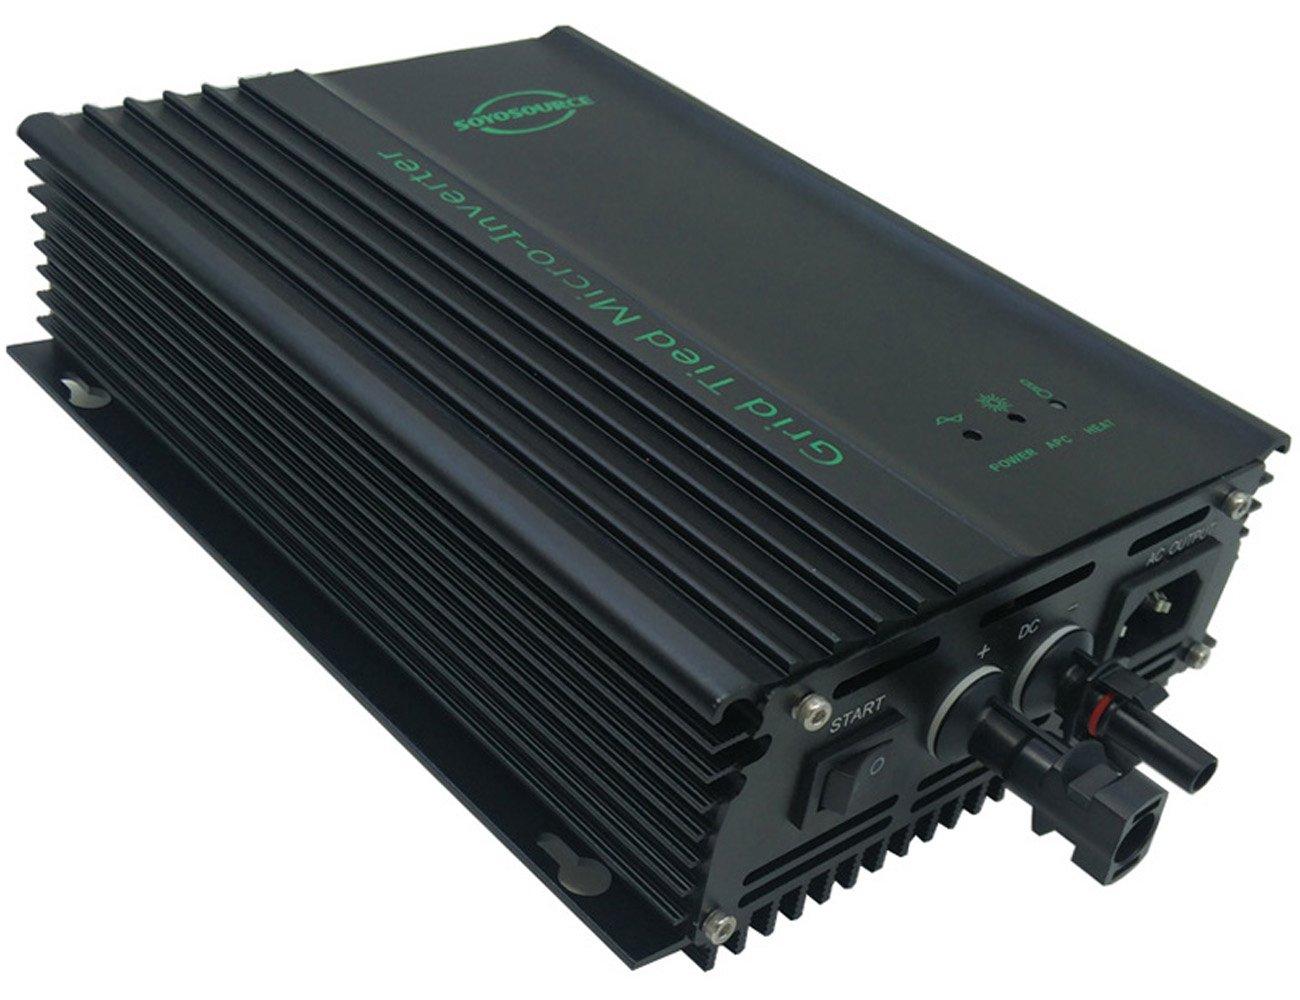 SOYOSOURCE 600w Grid Tie Solar Inverter Generator for PV-Input:40v-60V or 36v Battery Power Inverter for Home System